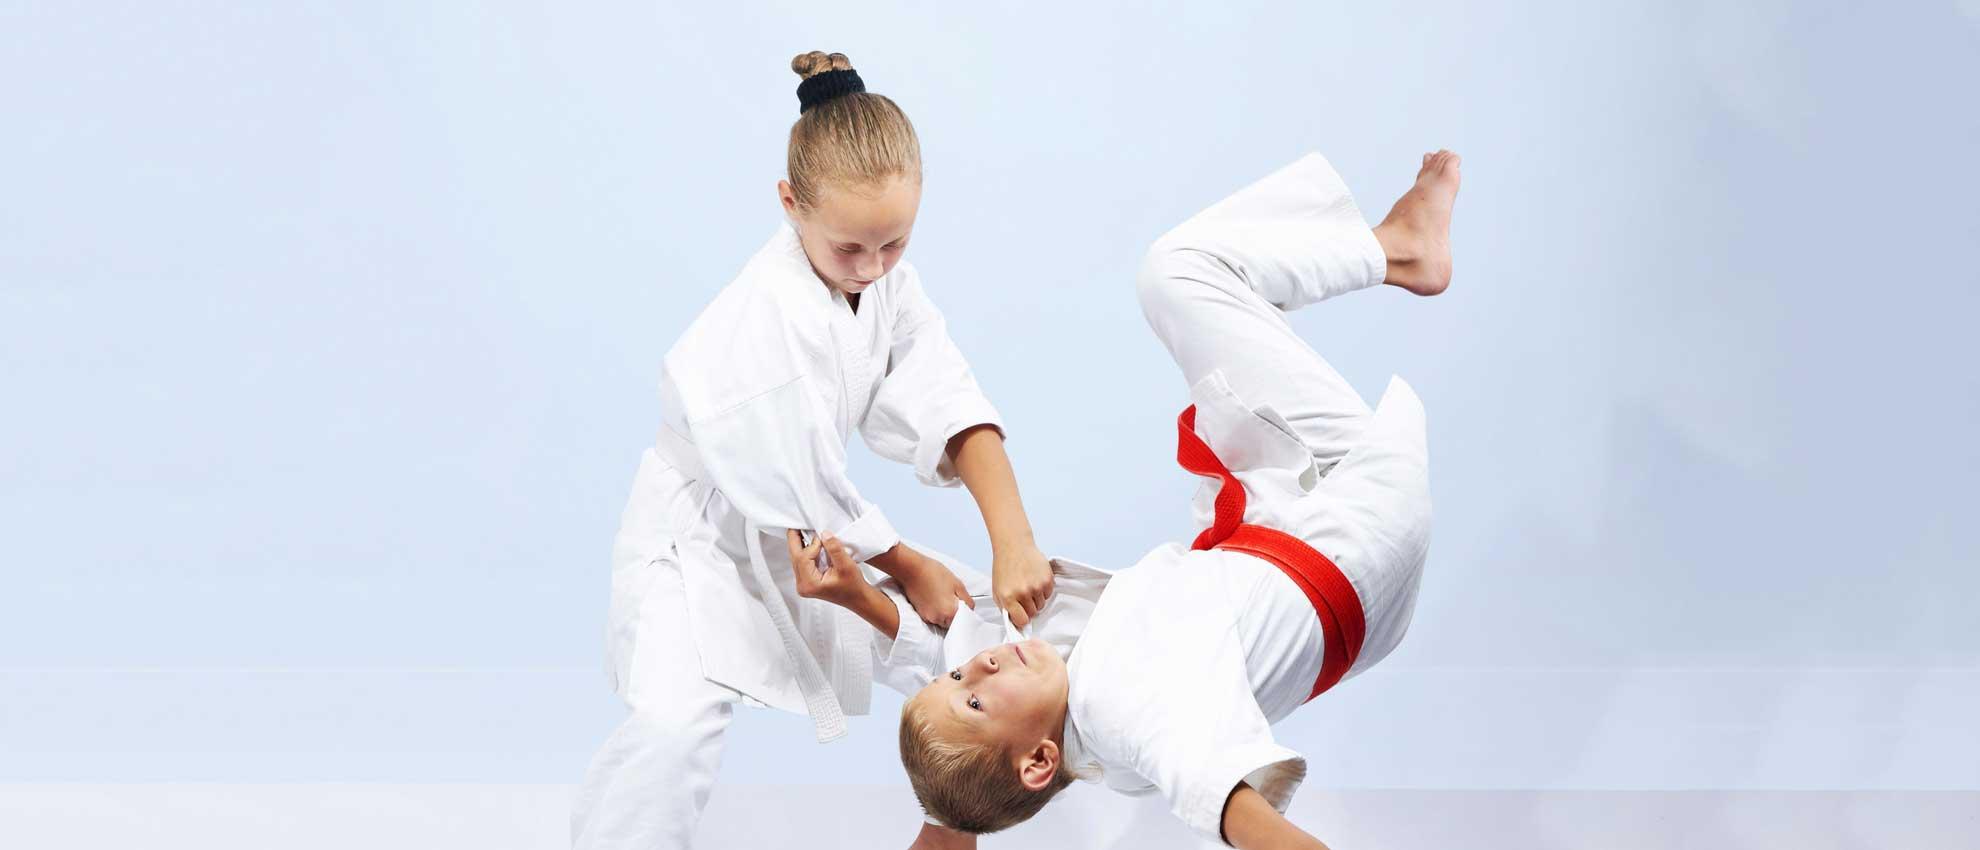 Banner novità judo